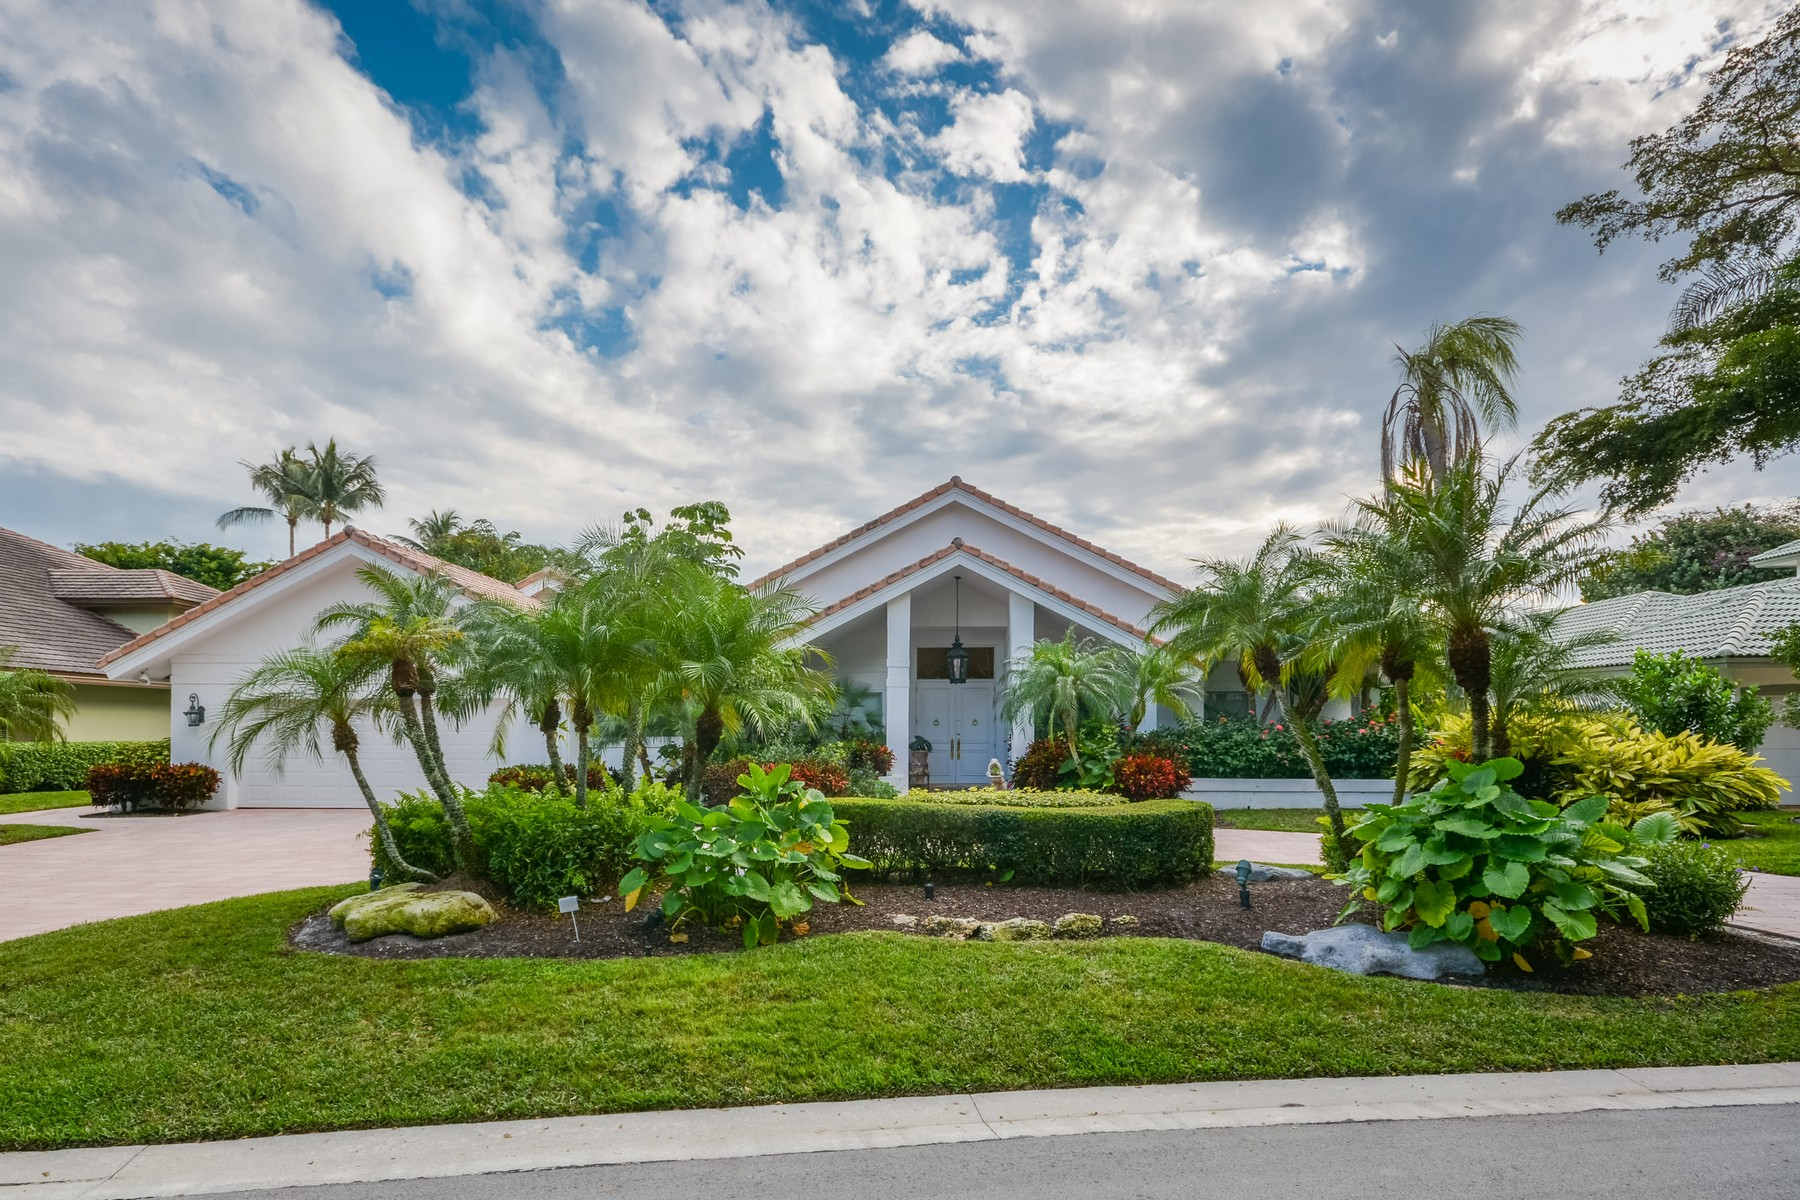 独户住宅 为 销售 在 7500 Mahogany Bend Pl , Boca Raton, FL 33434 7500 Mahogany Bend Pl 博卡拉顿, 佛罗里达州, 33434 美国